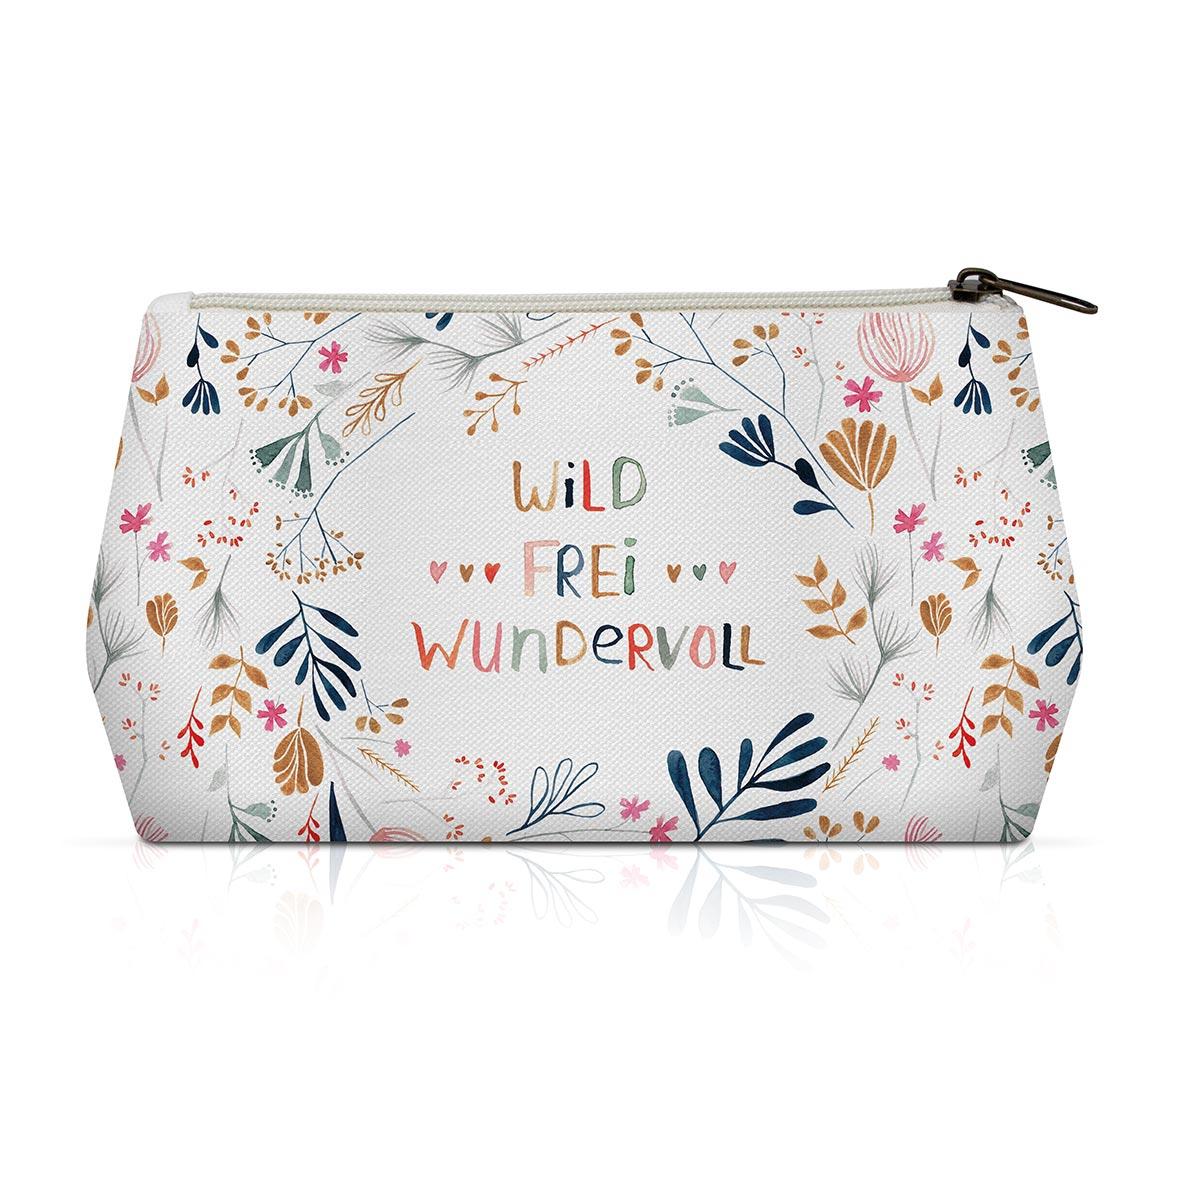 Cosmetic Bag - Wild, Frei, Wundervoll Cosmetic Bag